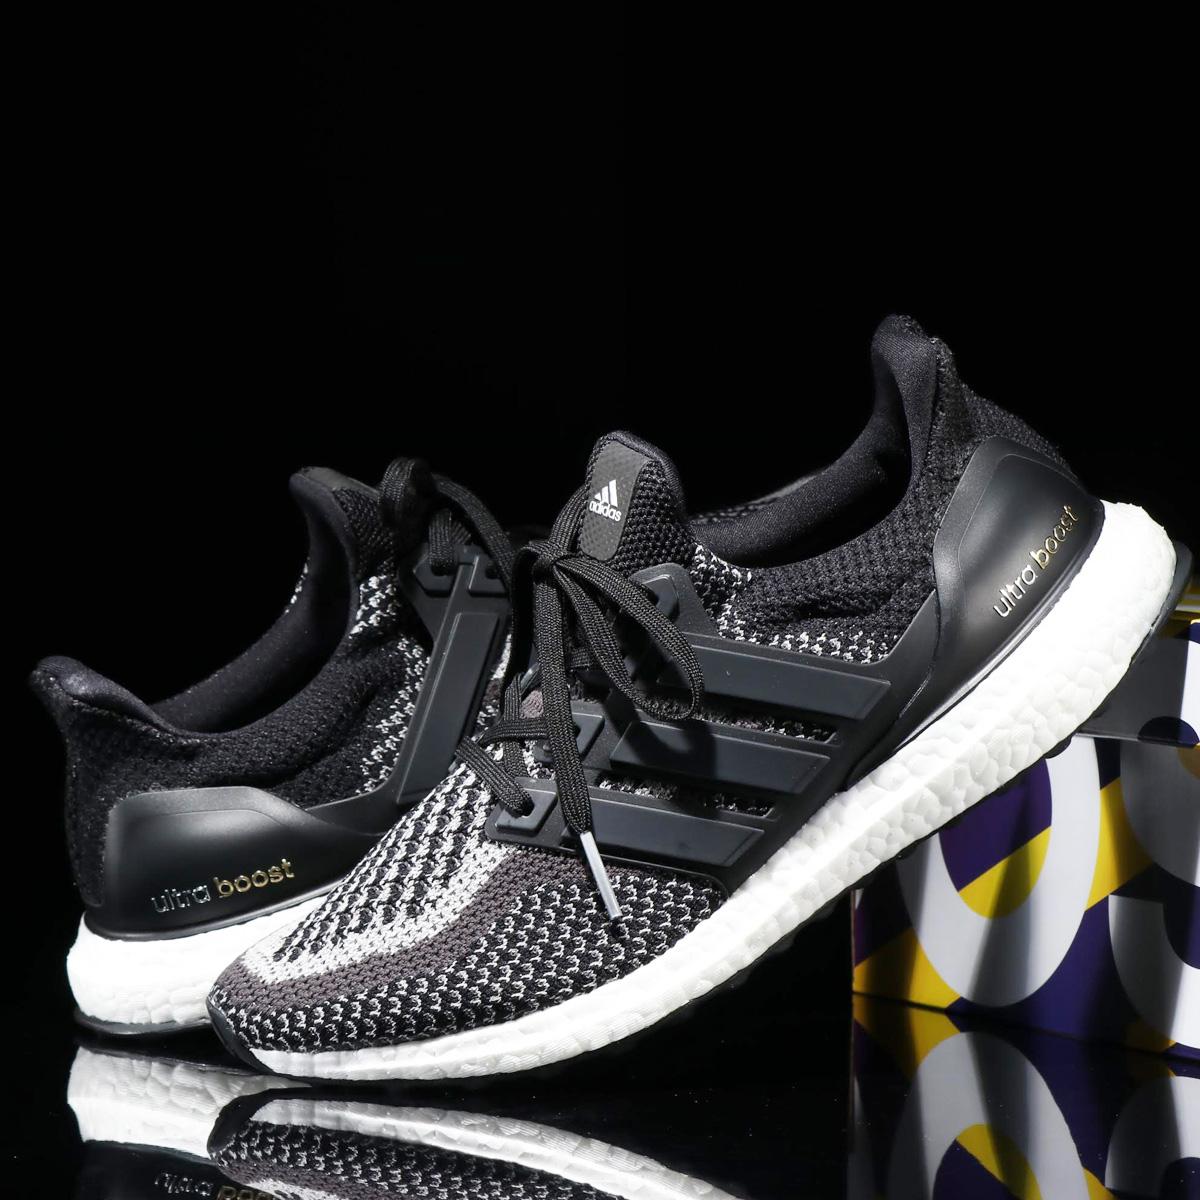 adidas UltraBOOST Ltd Glow (アディダス ウルトラブースト Ltd グロー)CORE BLACK/CORE BLACK/CORE BLACK